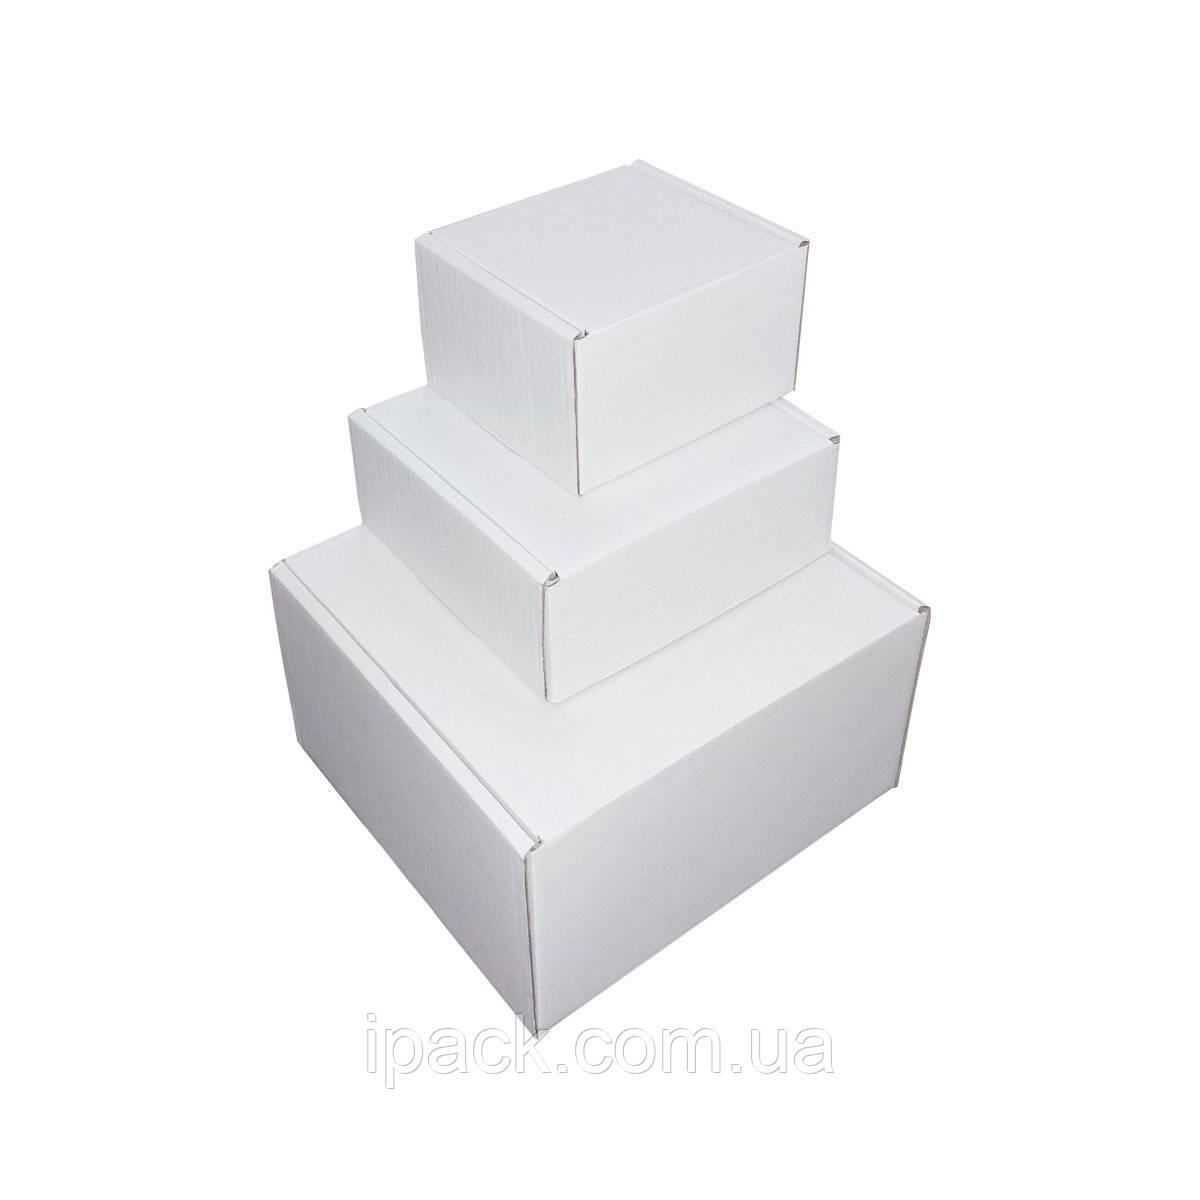 Коробка картонная самосборная 325*235*97 мм белая микрогофрокартон